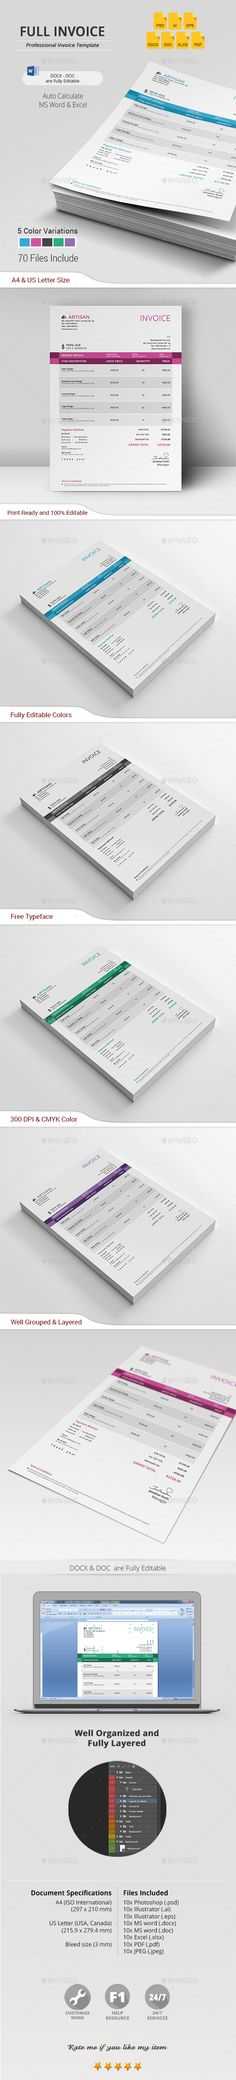 Invoice Print Templates